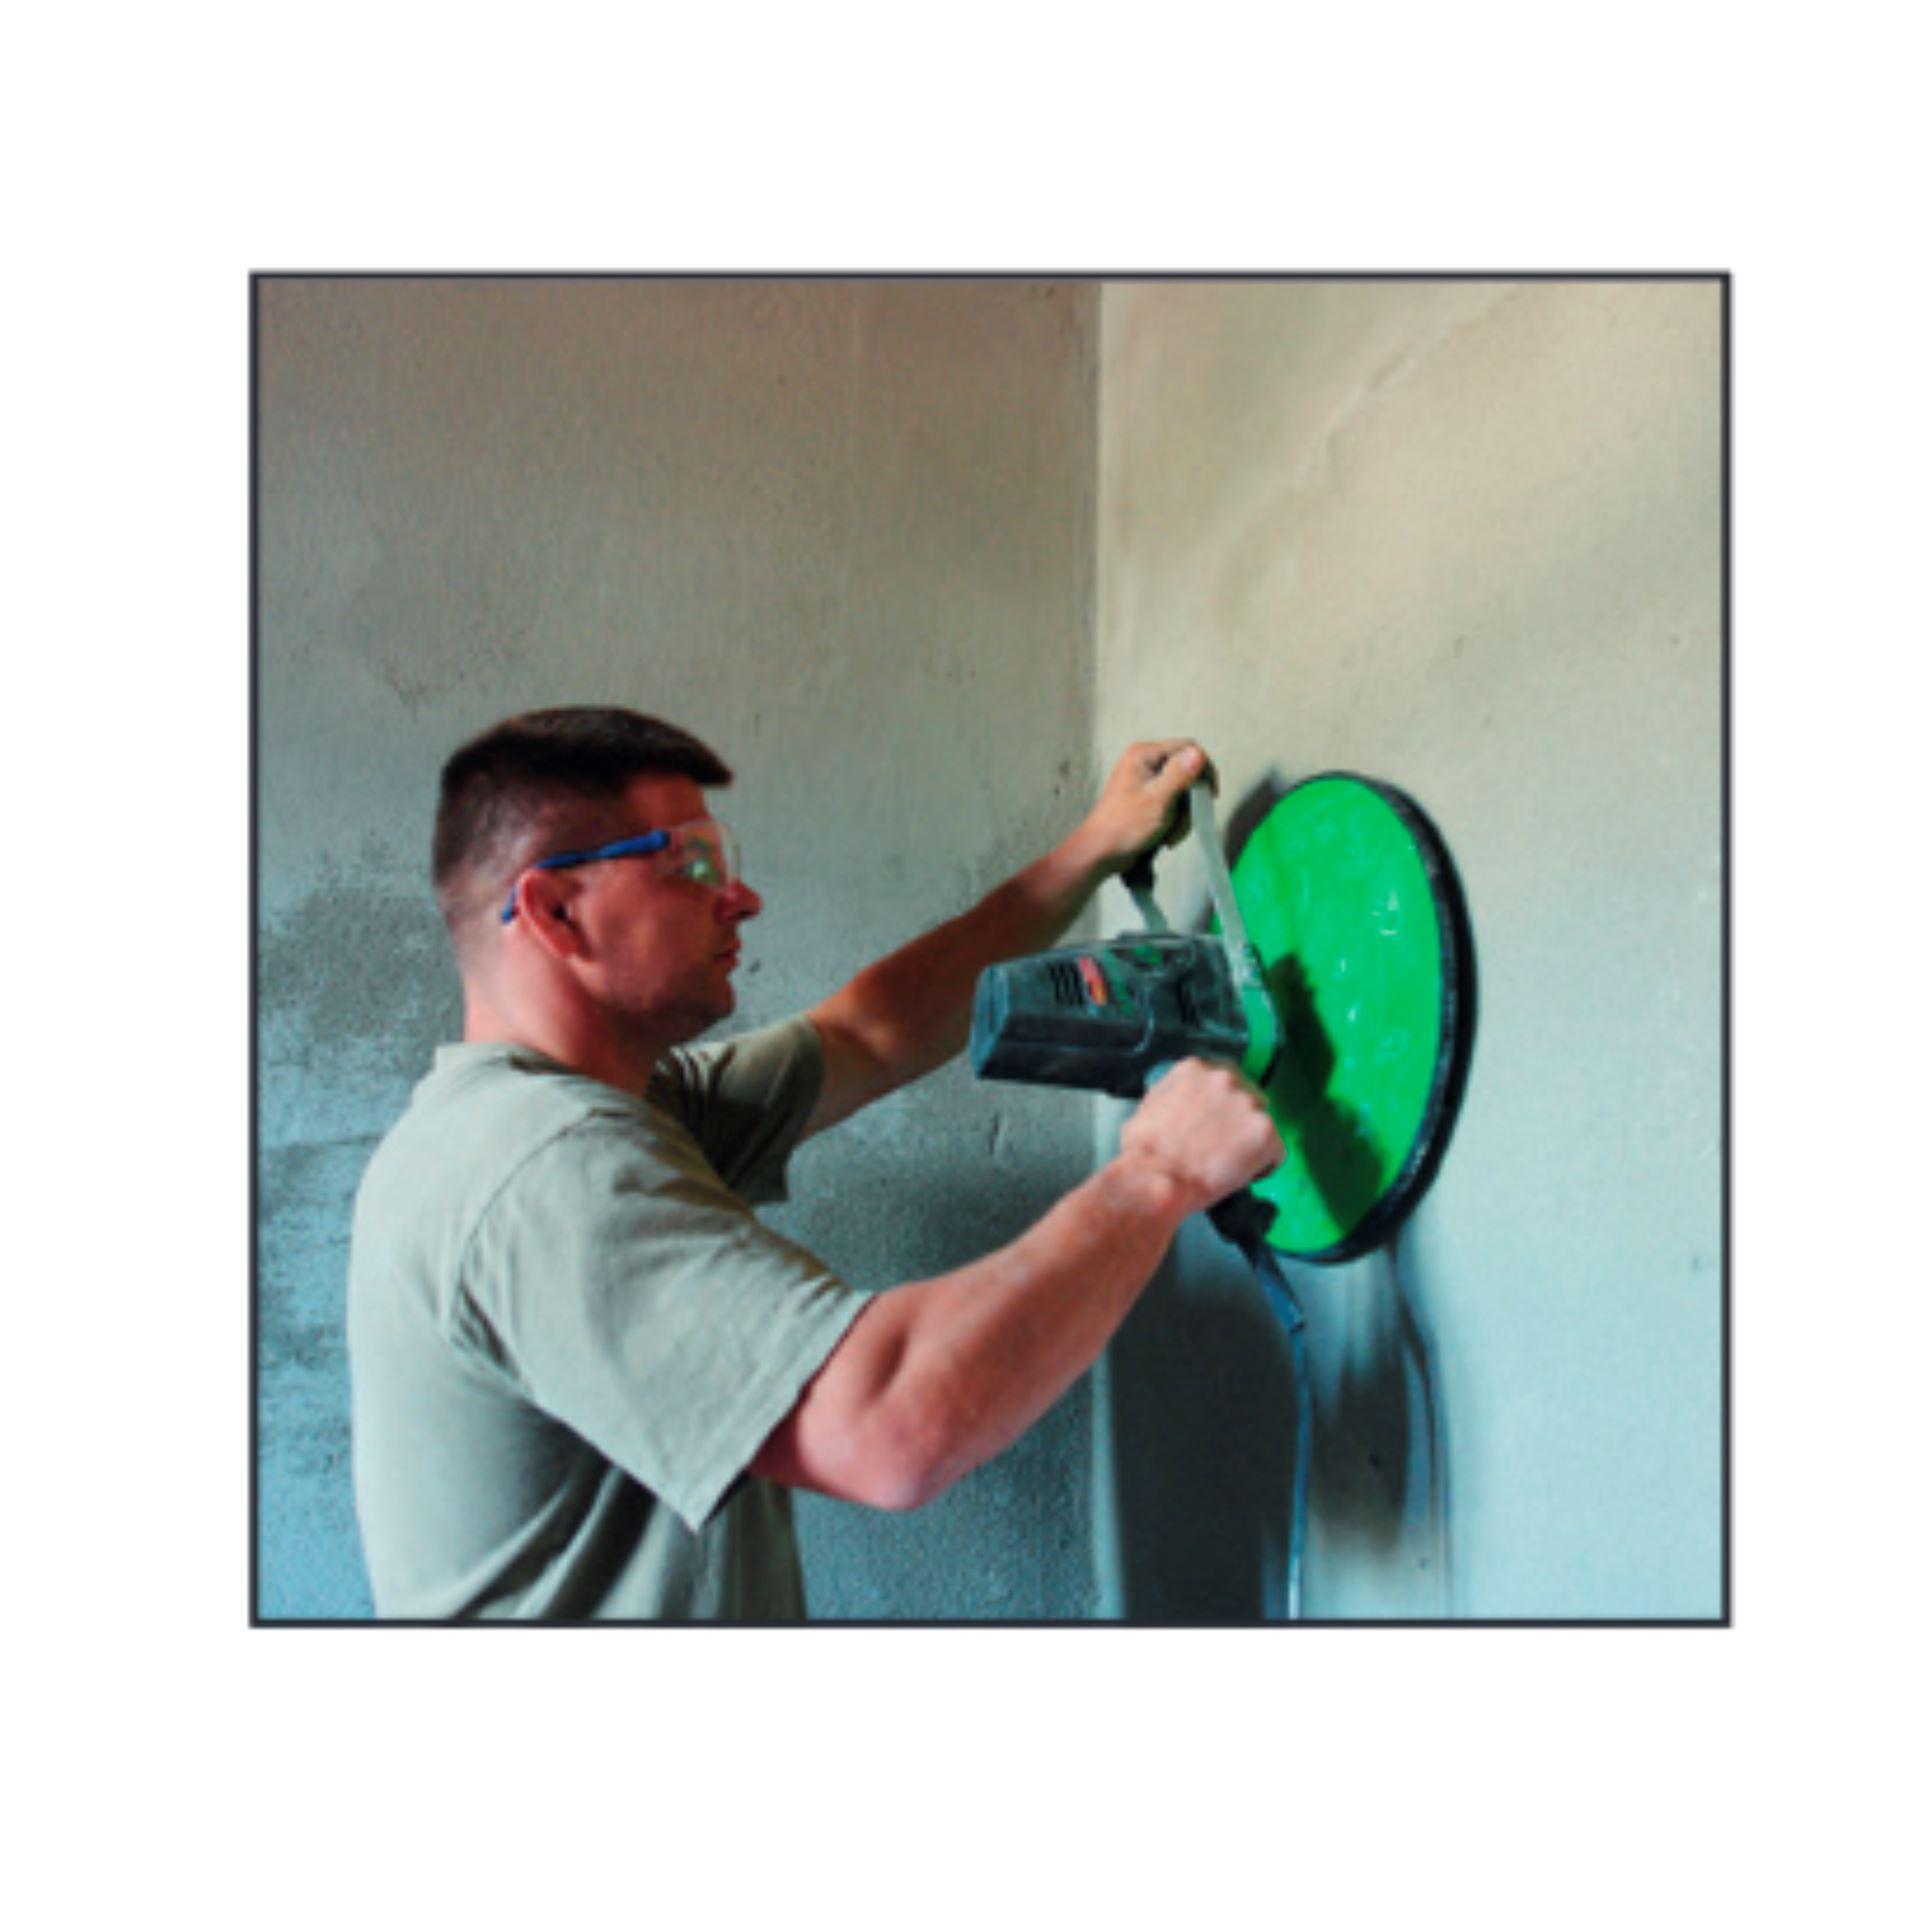 Imagen de Fratasadora para paredes Eibenstock EPG400 500W